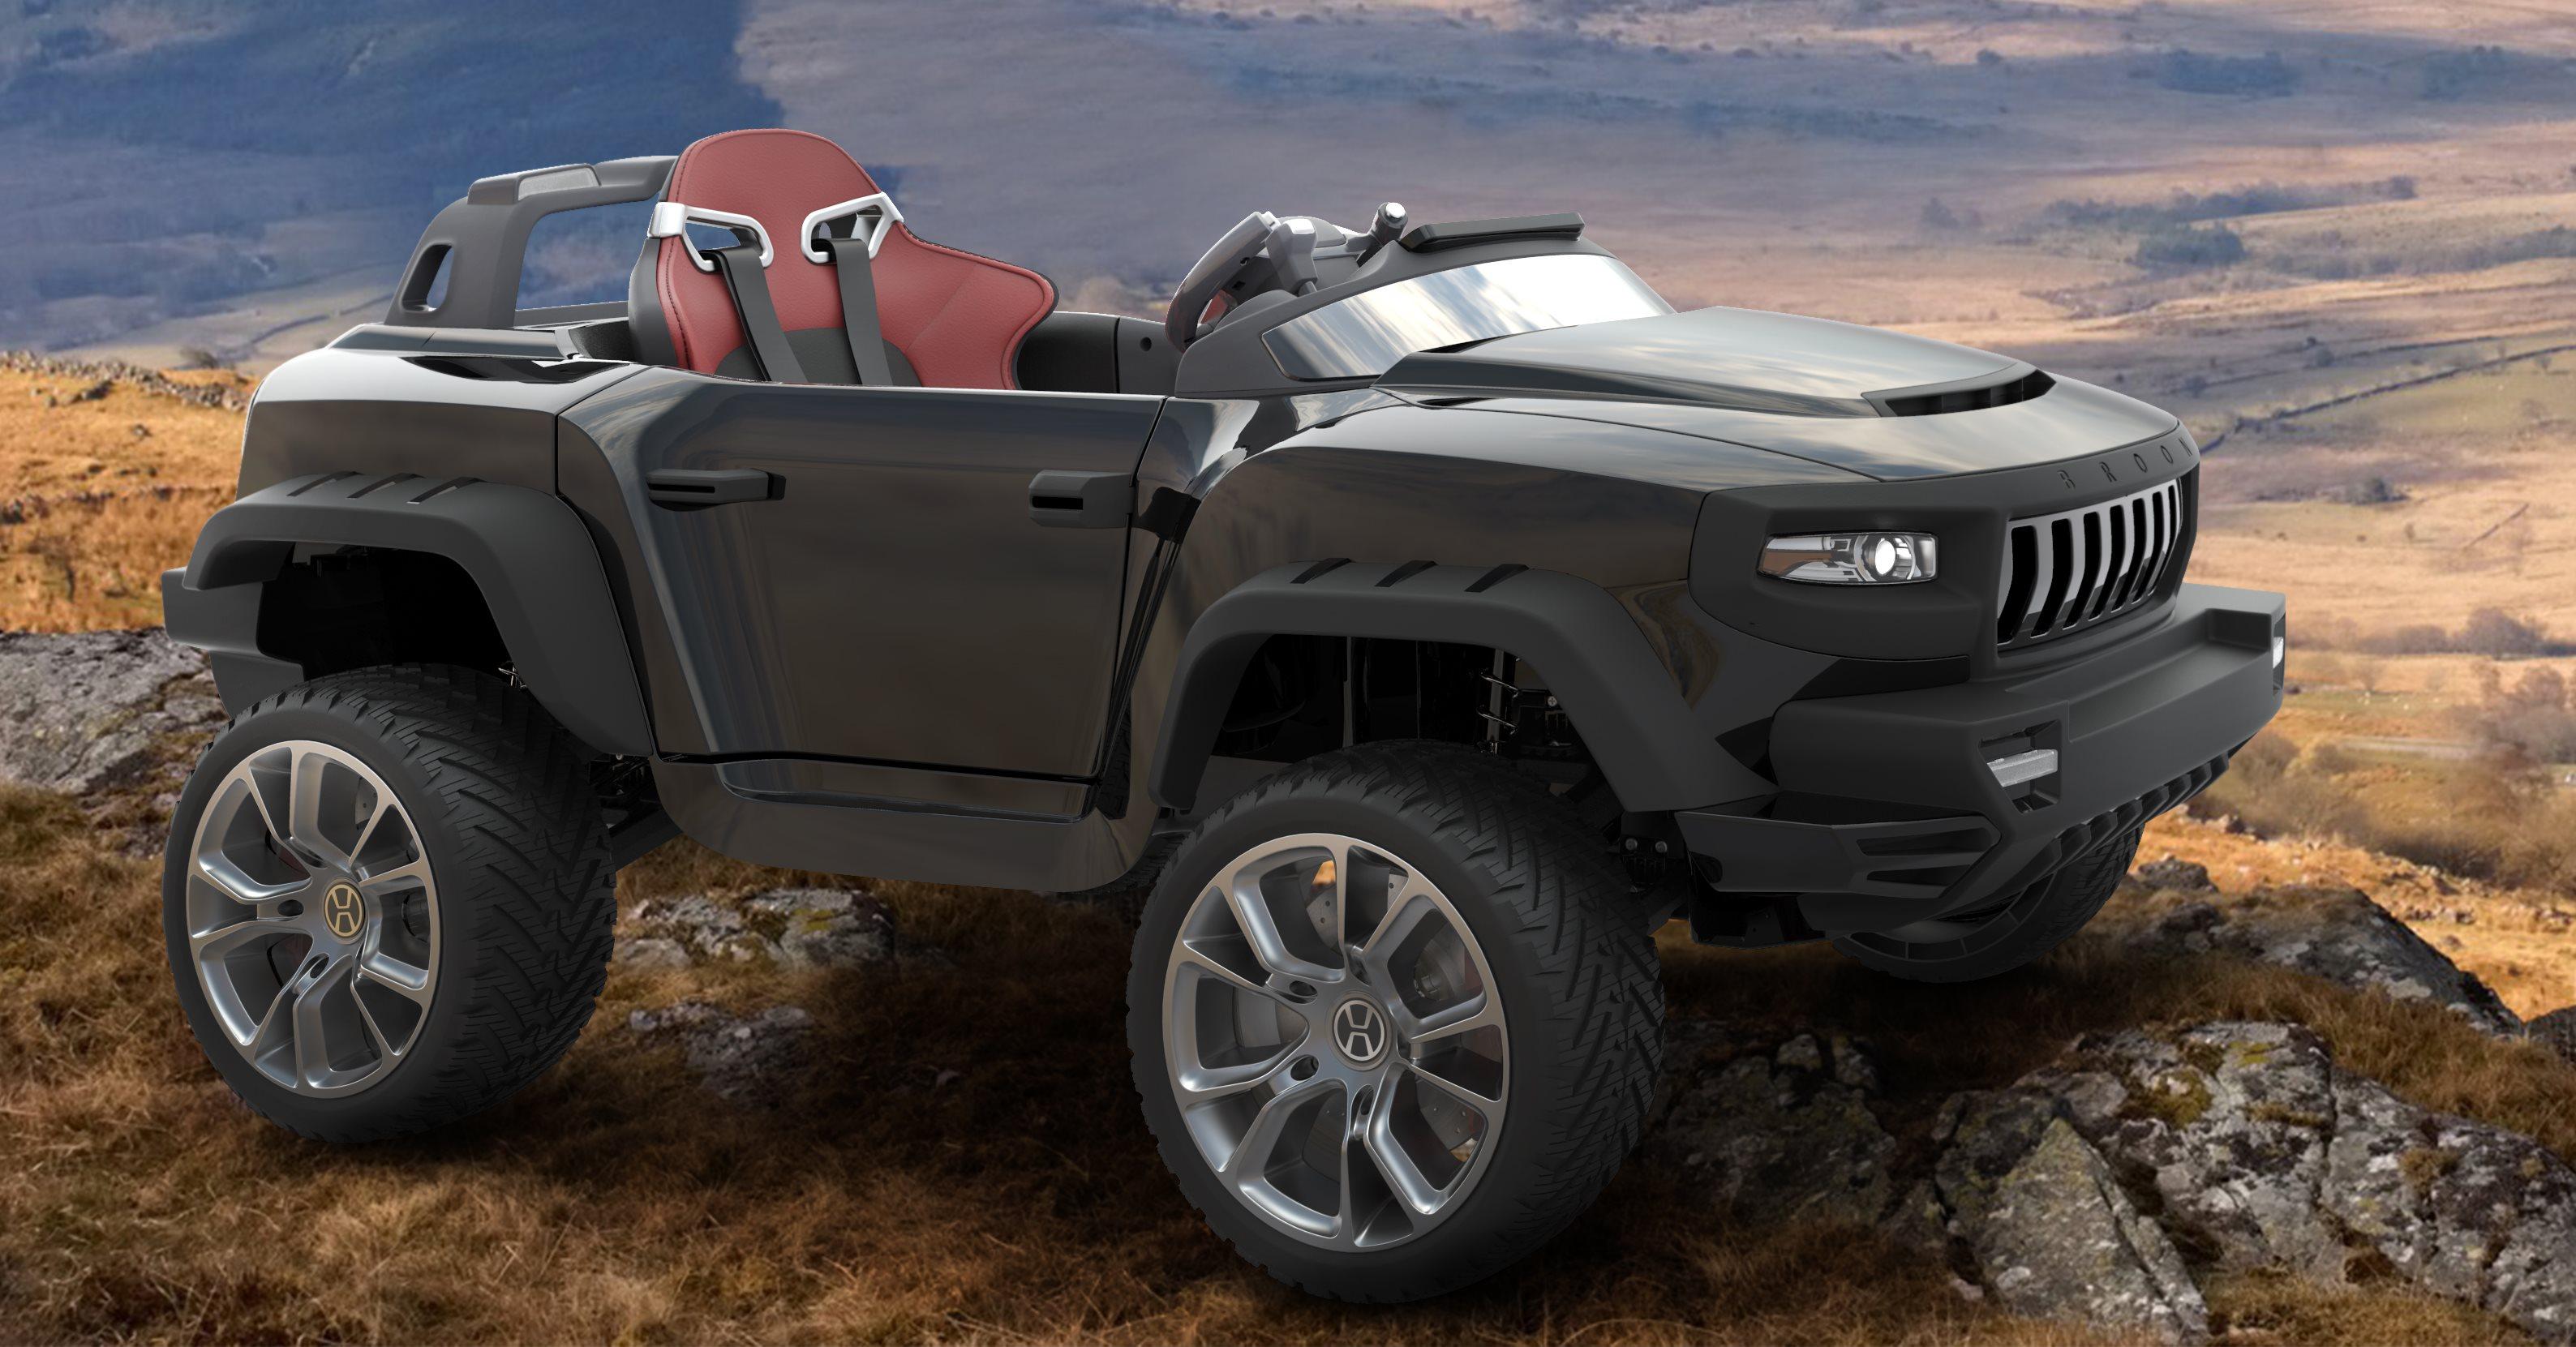 henes broon t870 schwarz luxus kinder elektro auto allrad. Black Bedroom Furniture Sets. Home Design Ideas